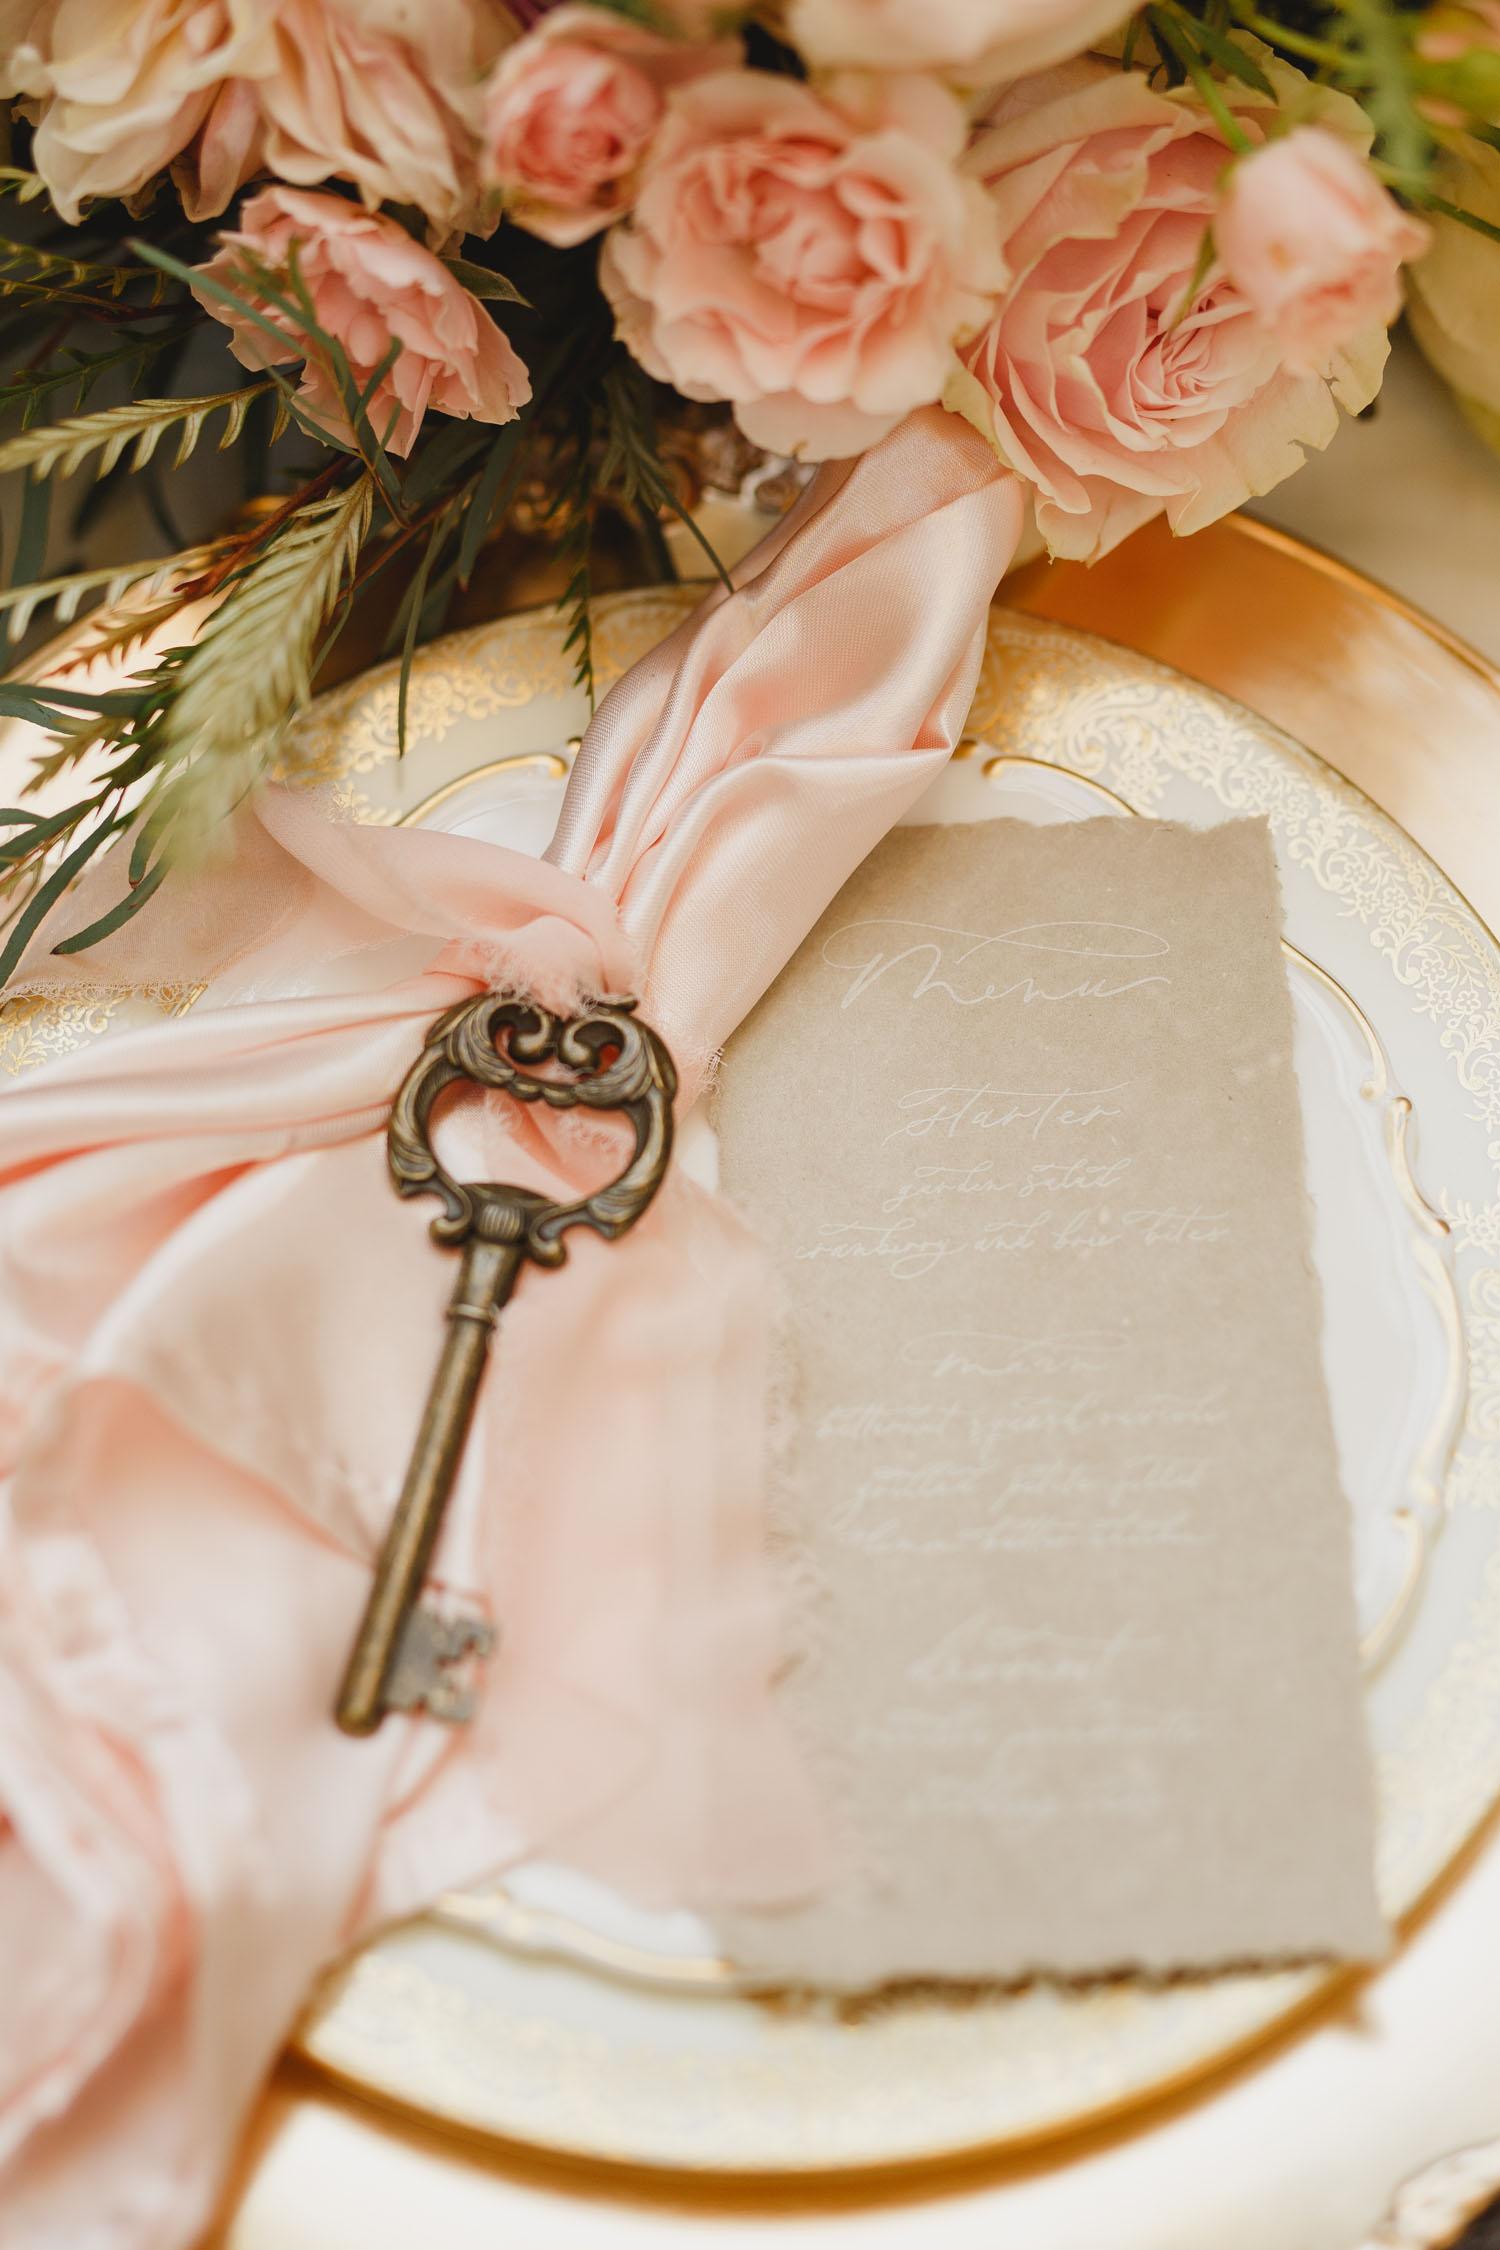 vintage key plate setting